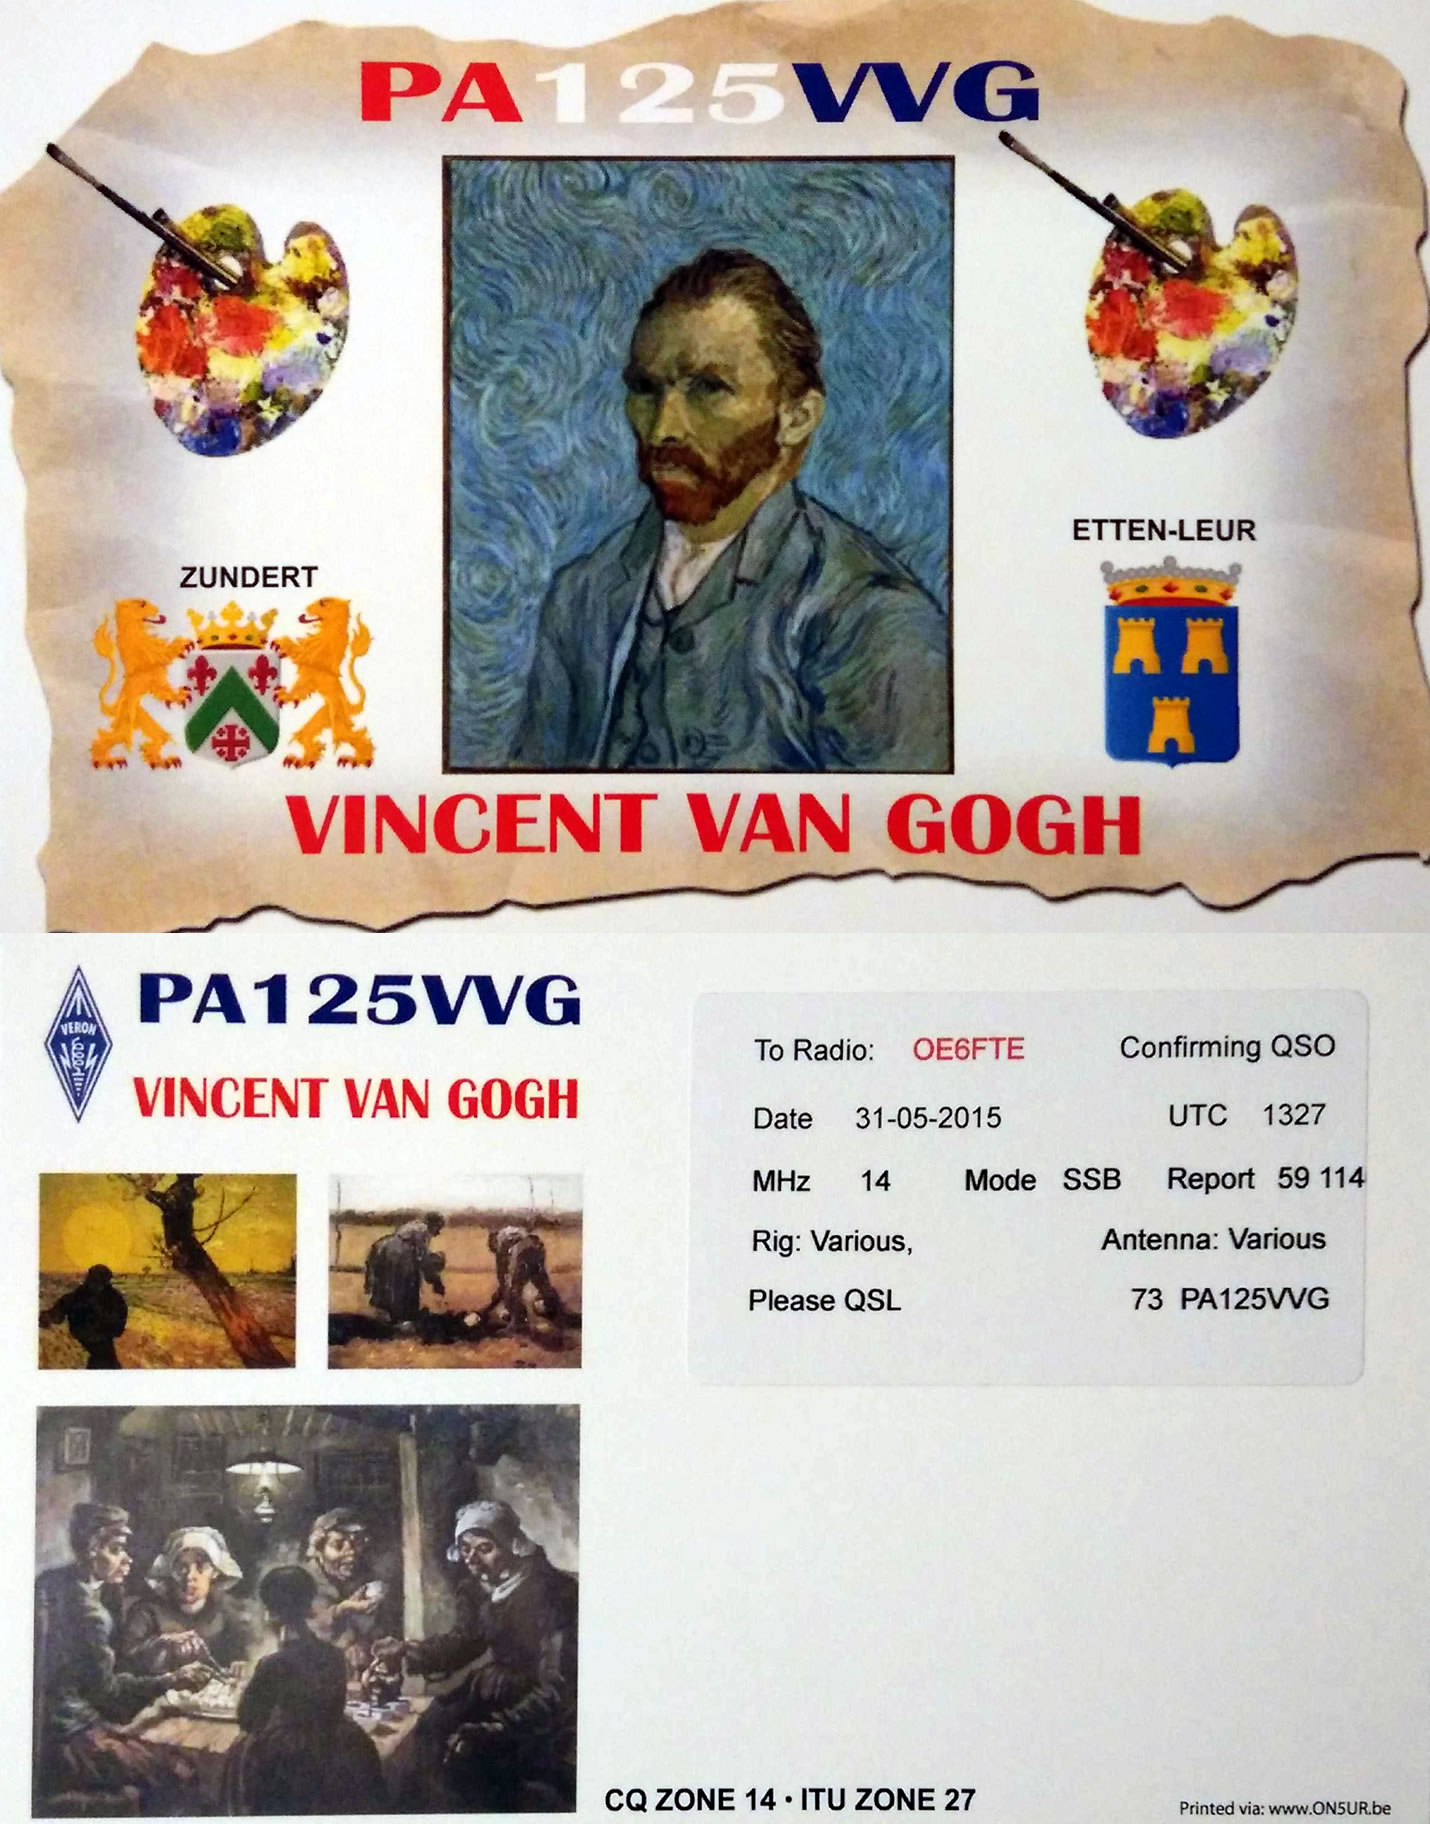 PA125VVG